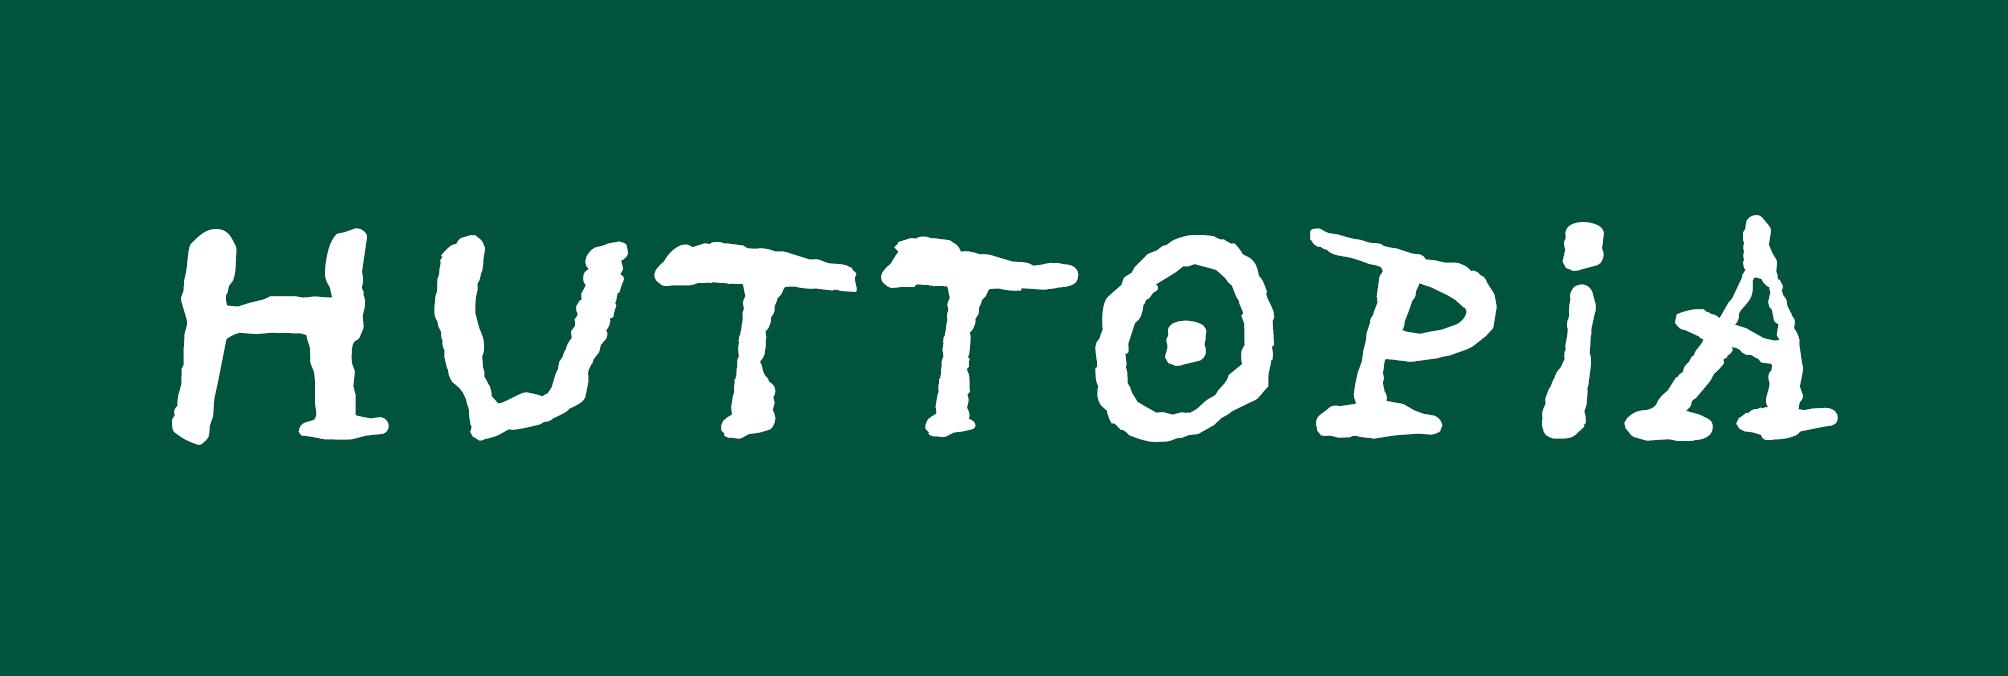 Huttopia Oléron Les Pins